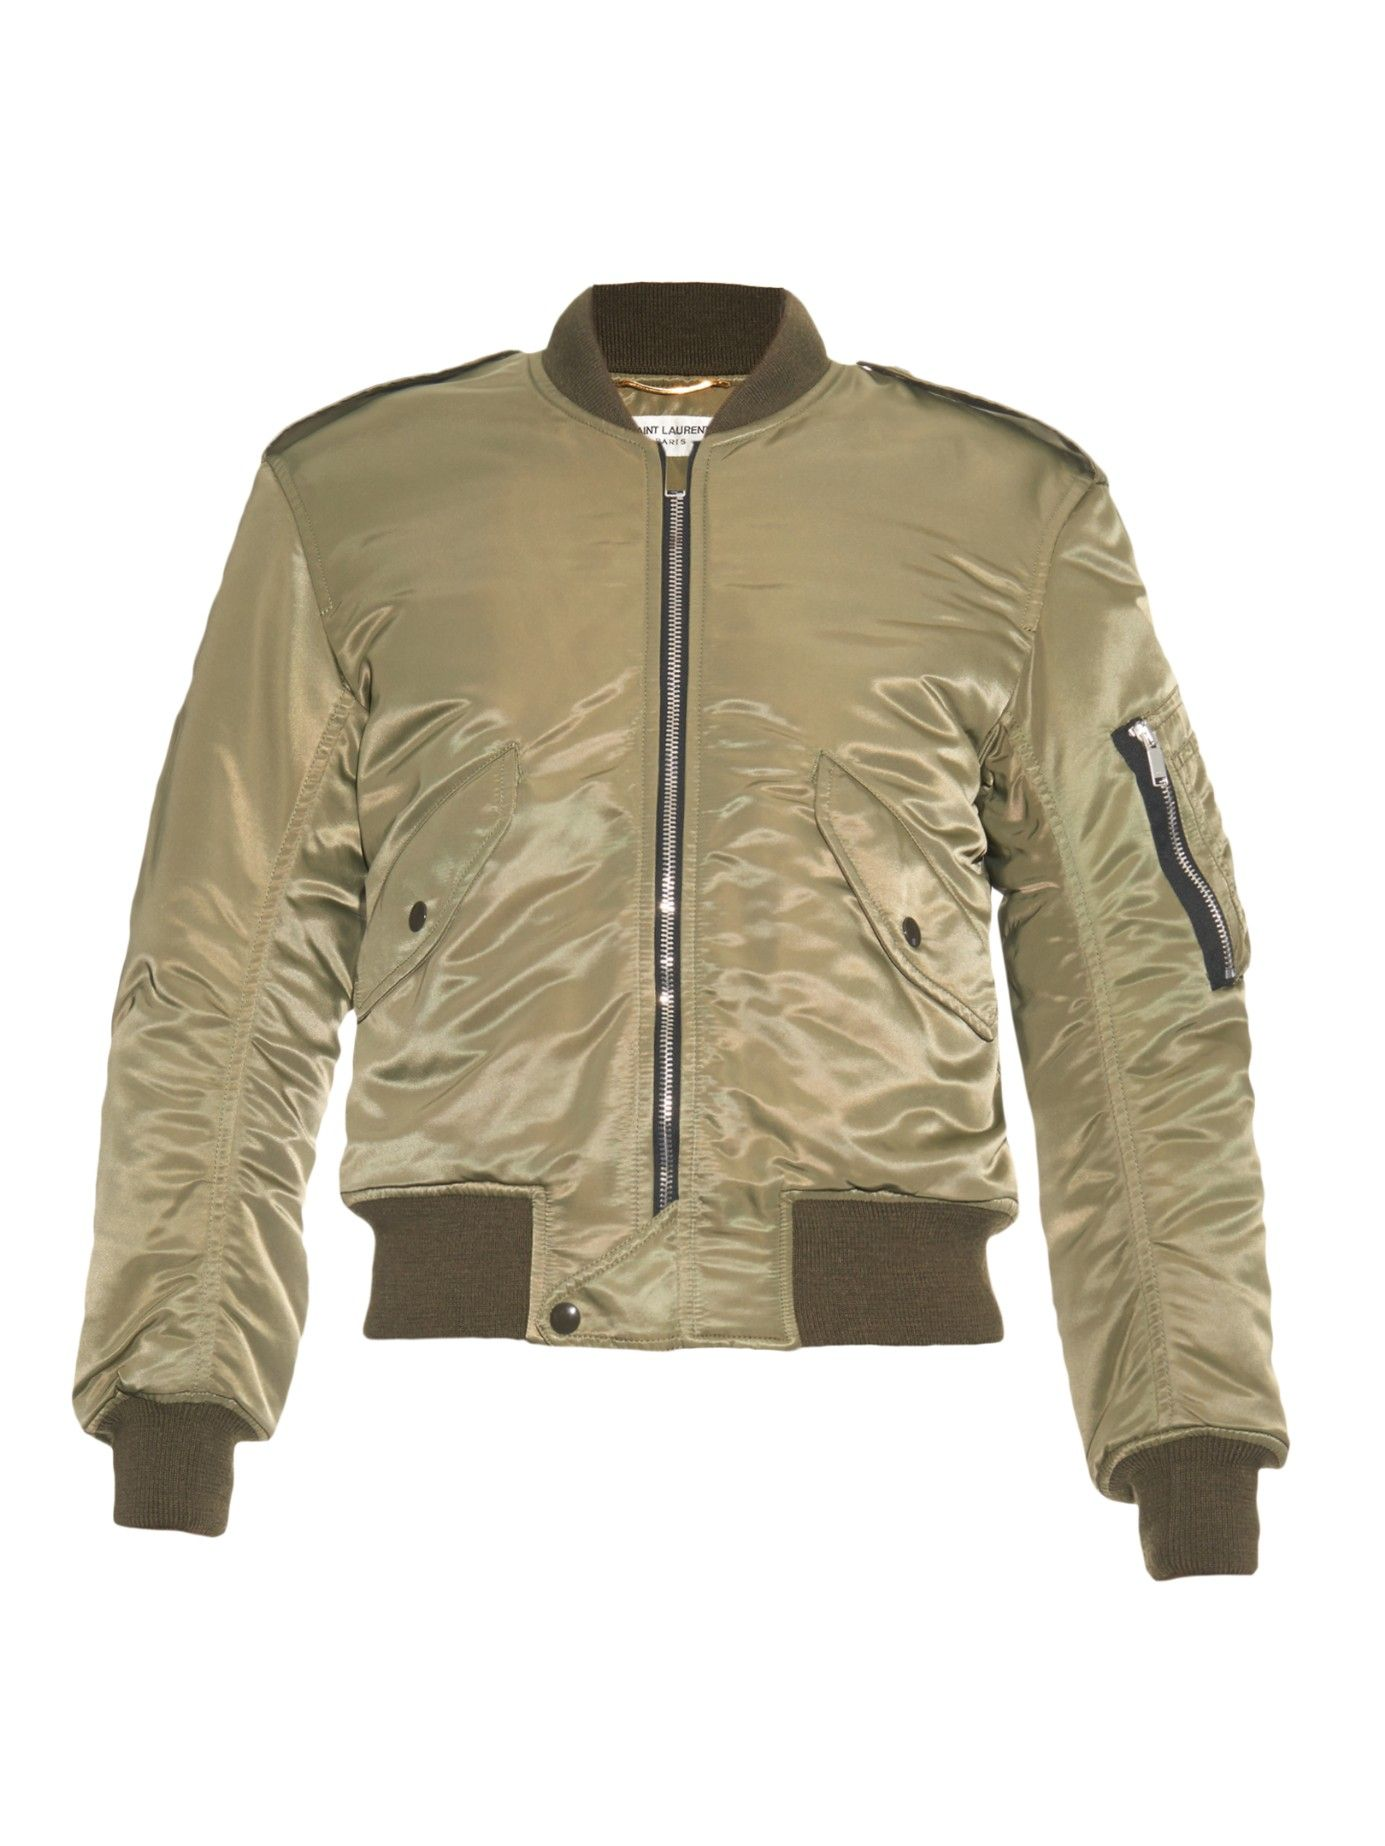 Patch-pocket aviator jacket   Saint Laurent   MATCHESFASHION.COM US